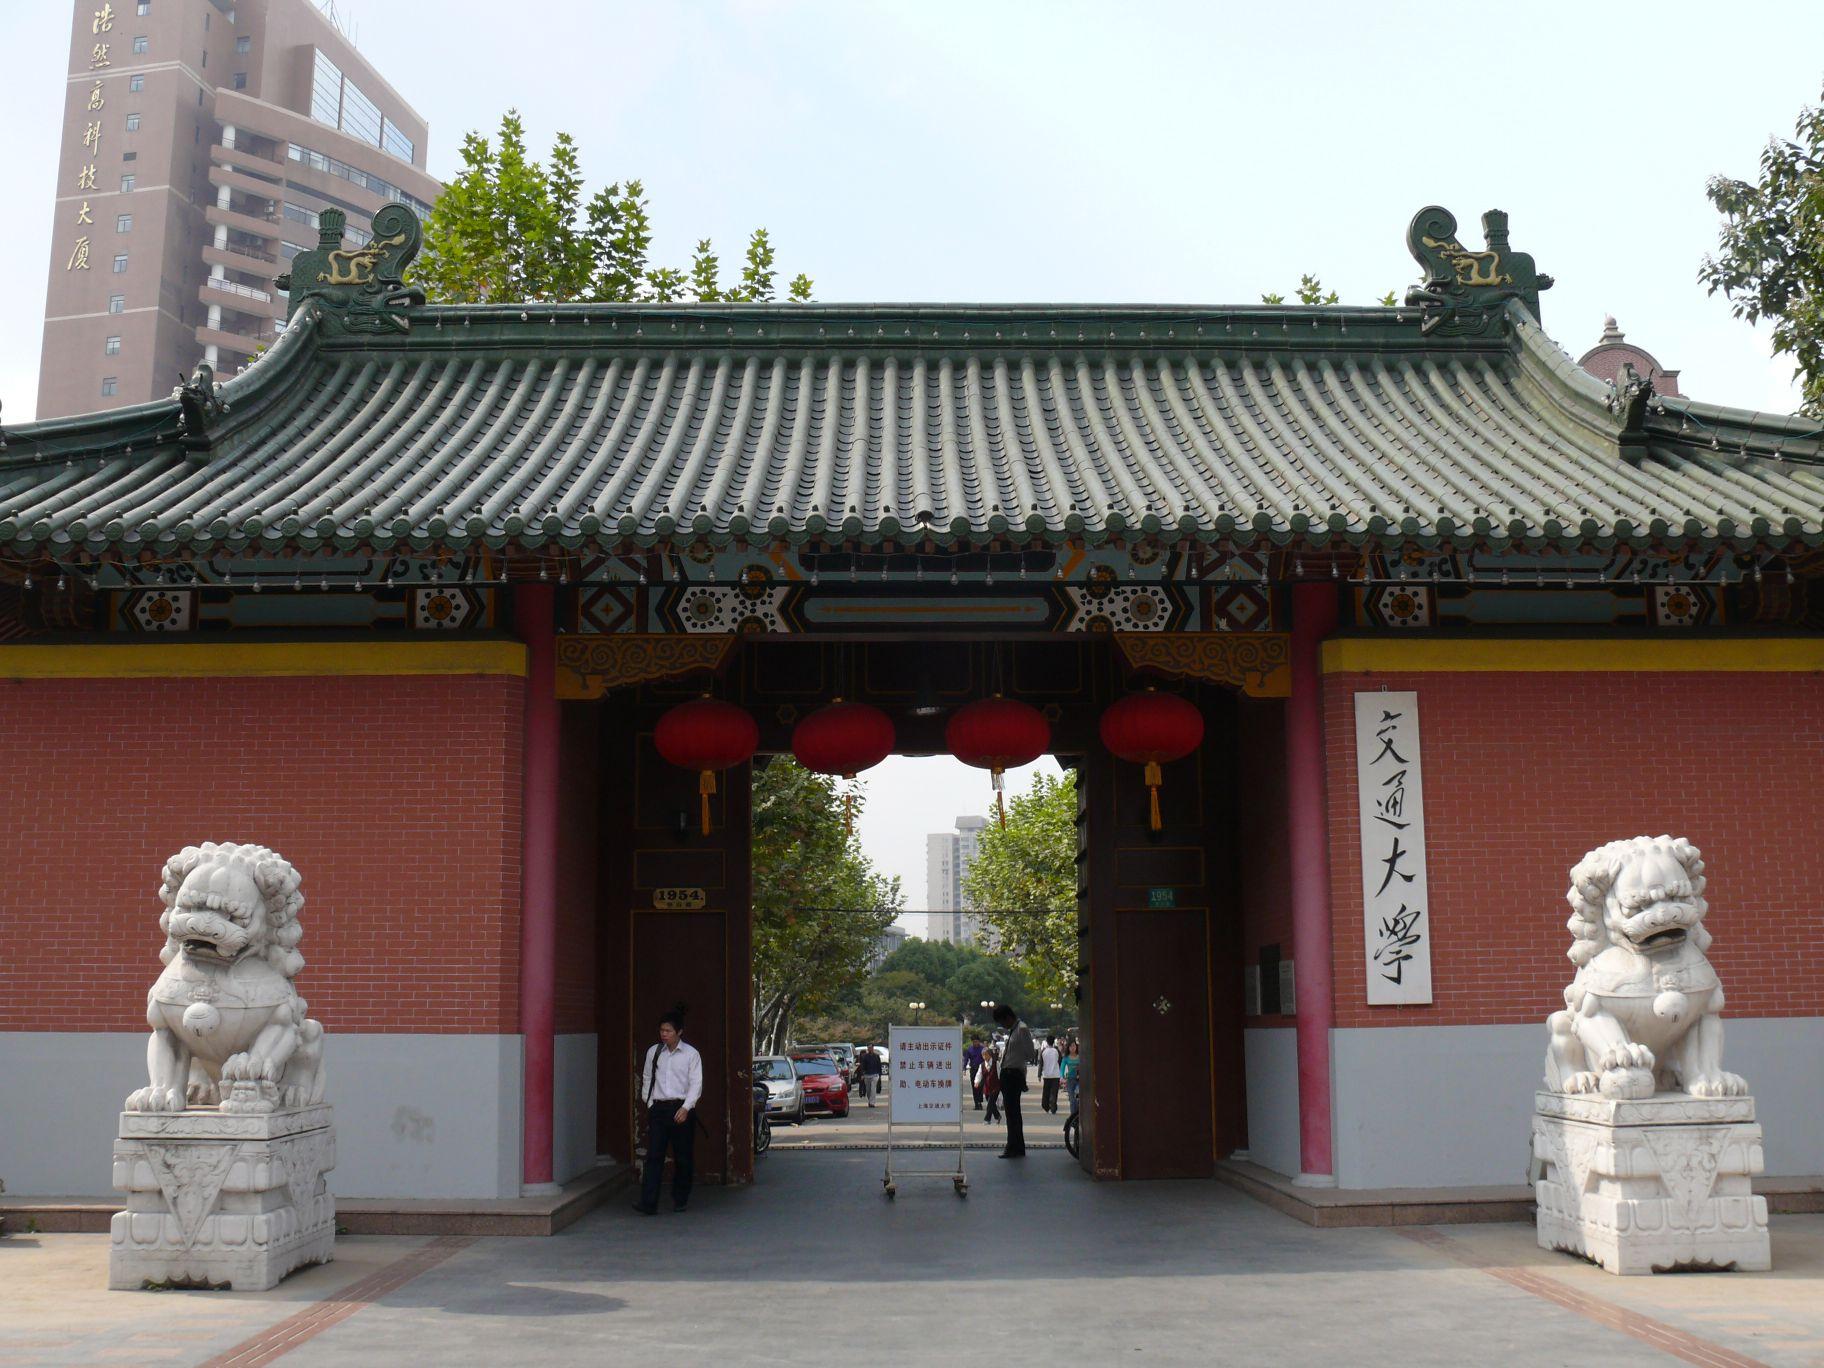 image of Shanghai Jiao Tong University